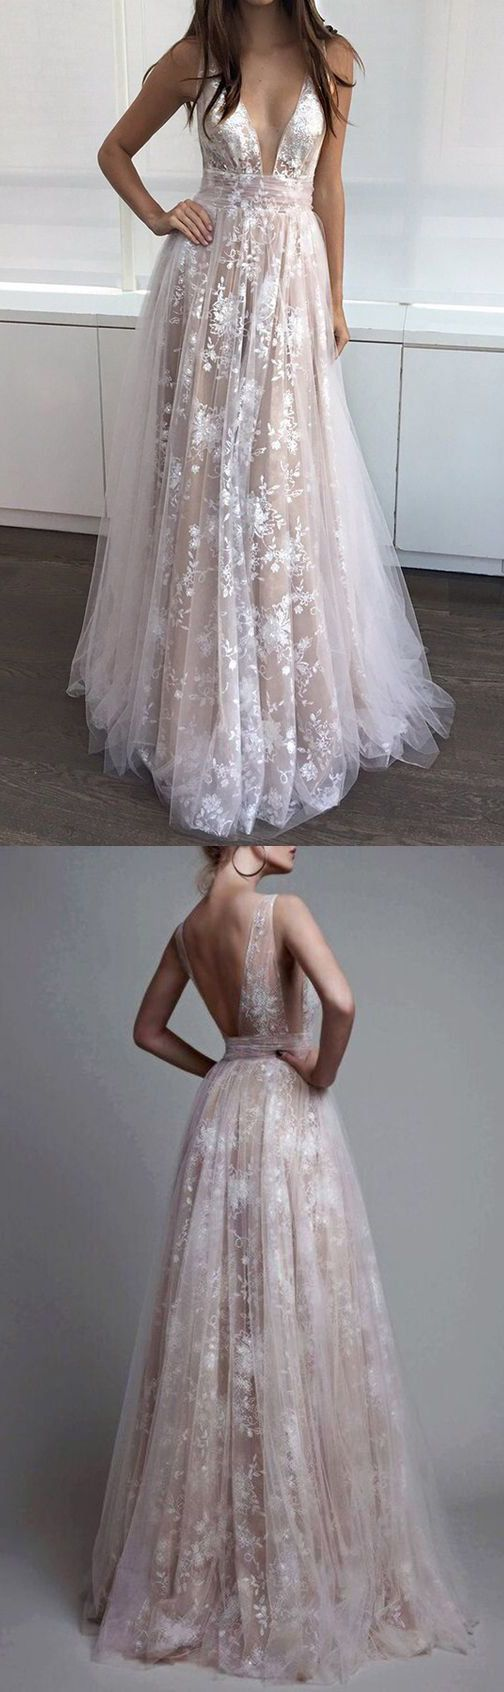 prom dresses,prom dresses,long prom dresses,lace prom party dresses,lace backless prom dresses,backless evening dresses